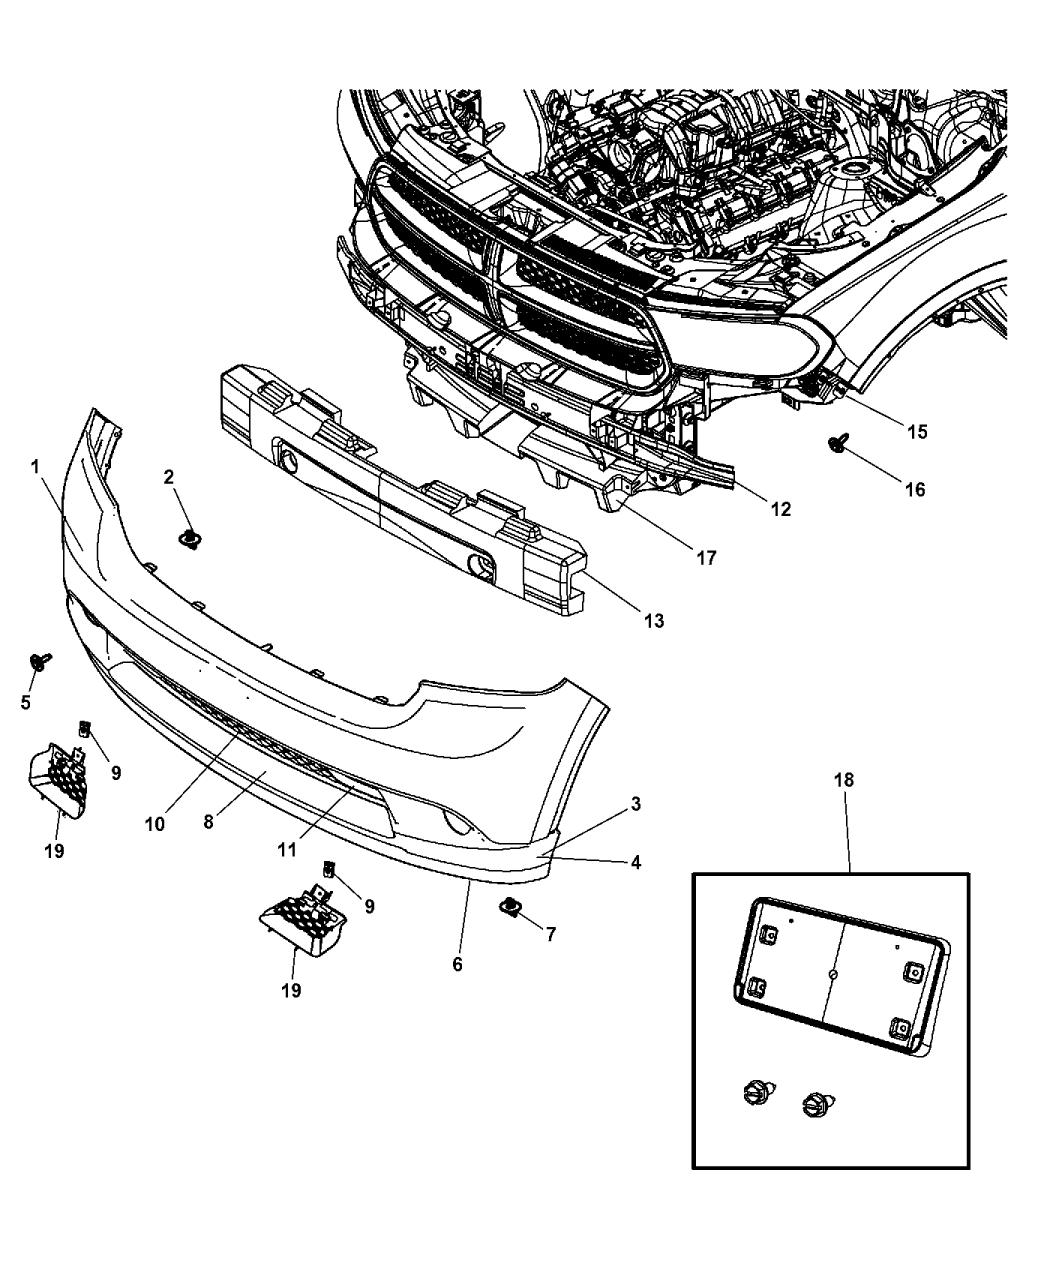 68089170AB - Genuine Dodge GRILLE-FASCIA